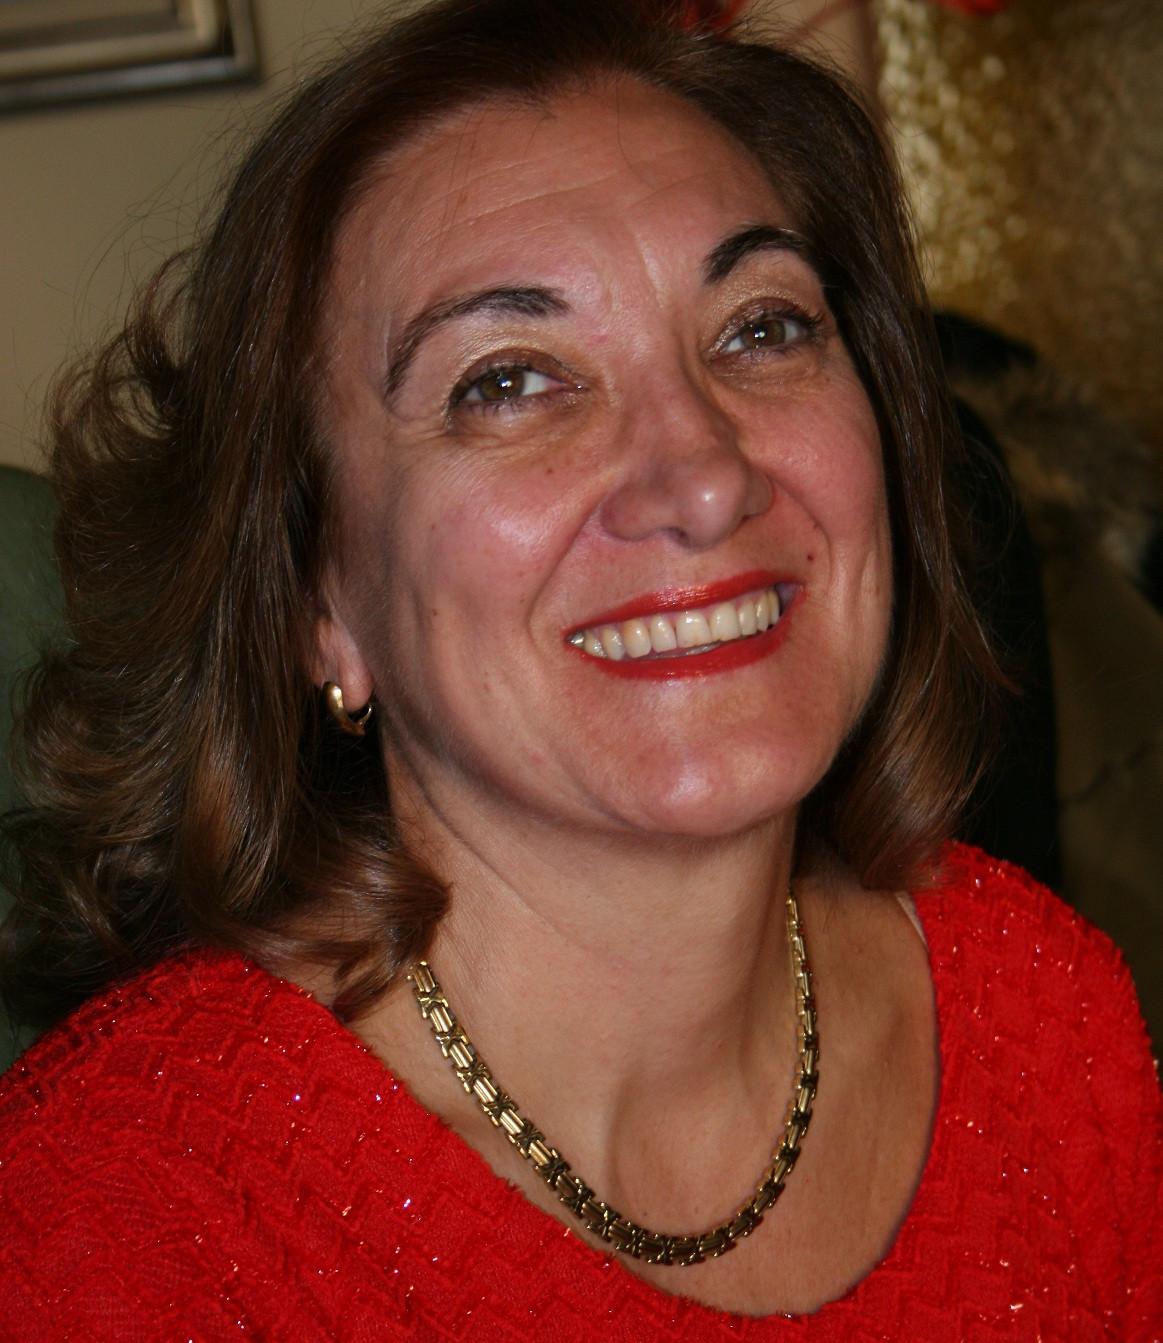 Guadalupe Iglesias